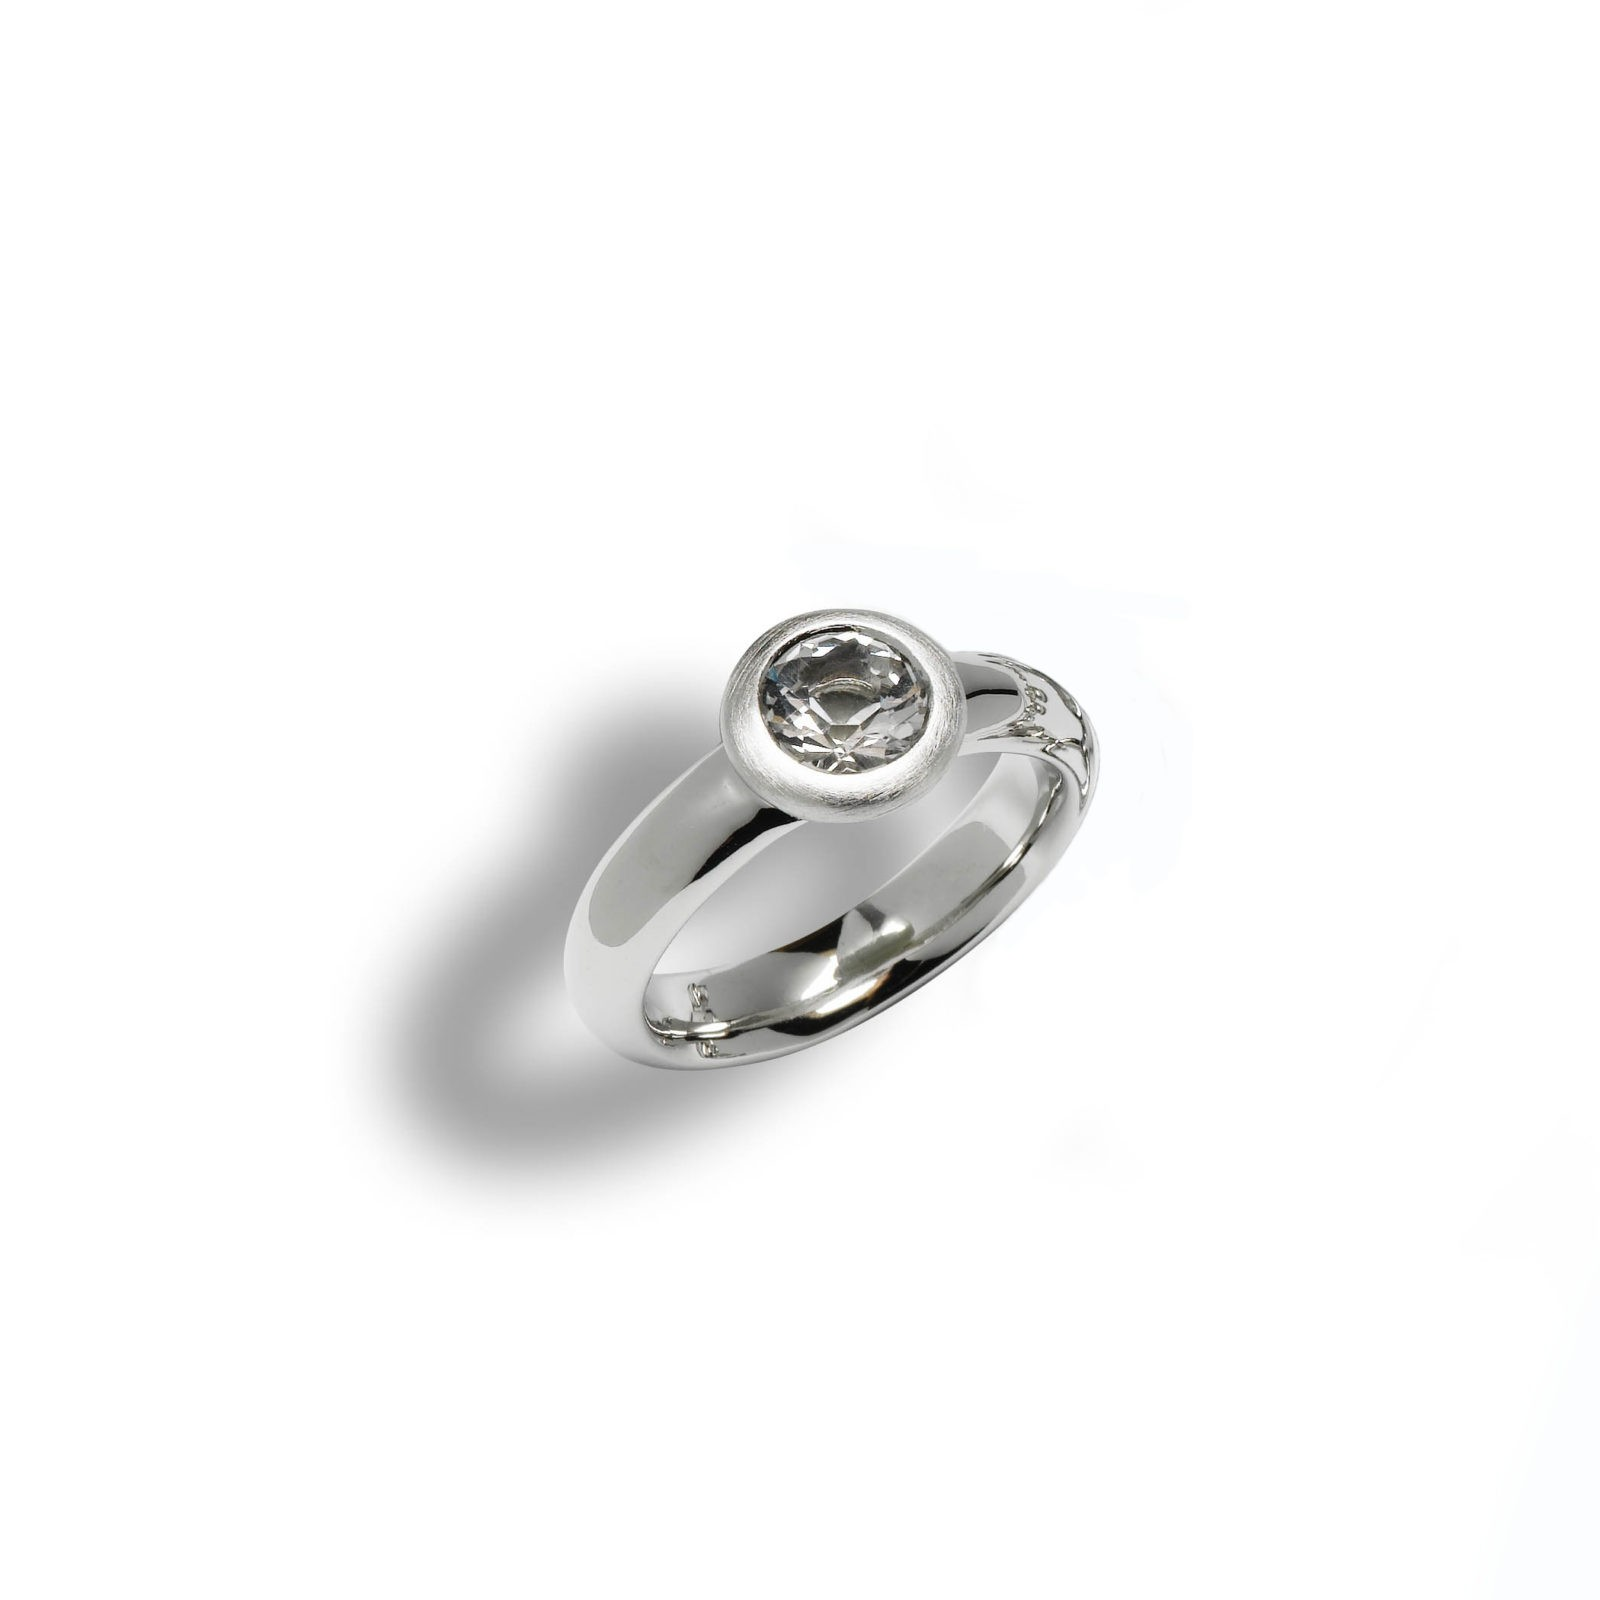 Bergkristall_Schmuck_Ring_Silber matt 130